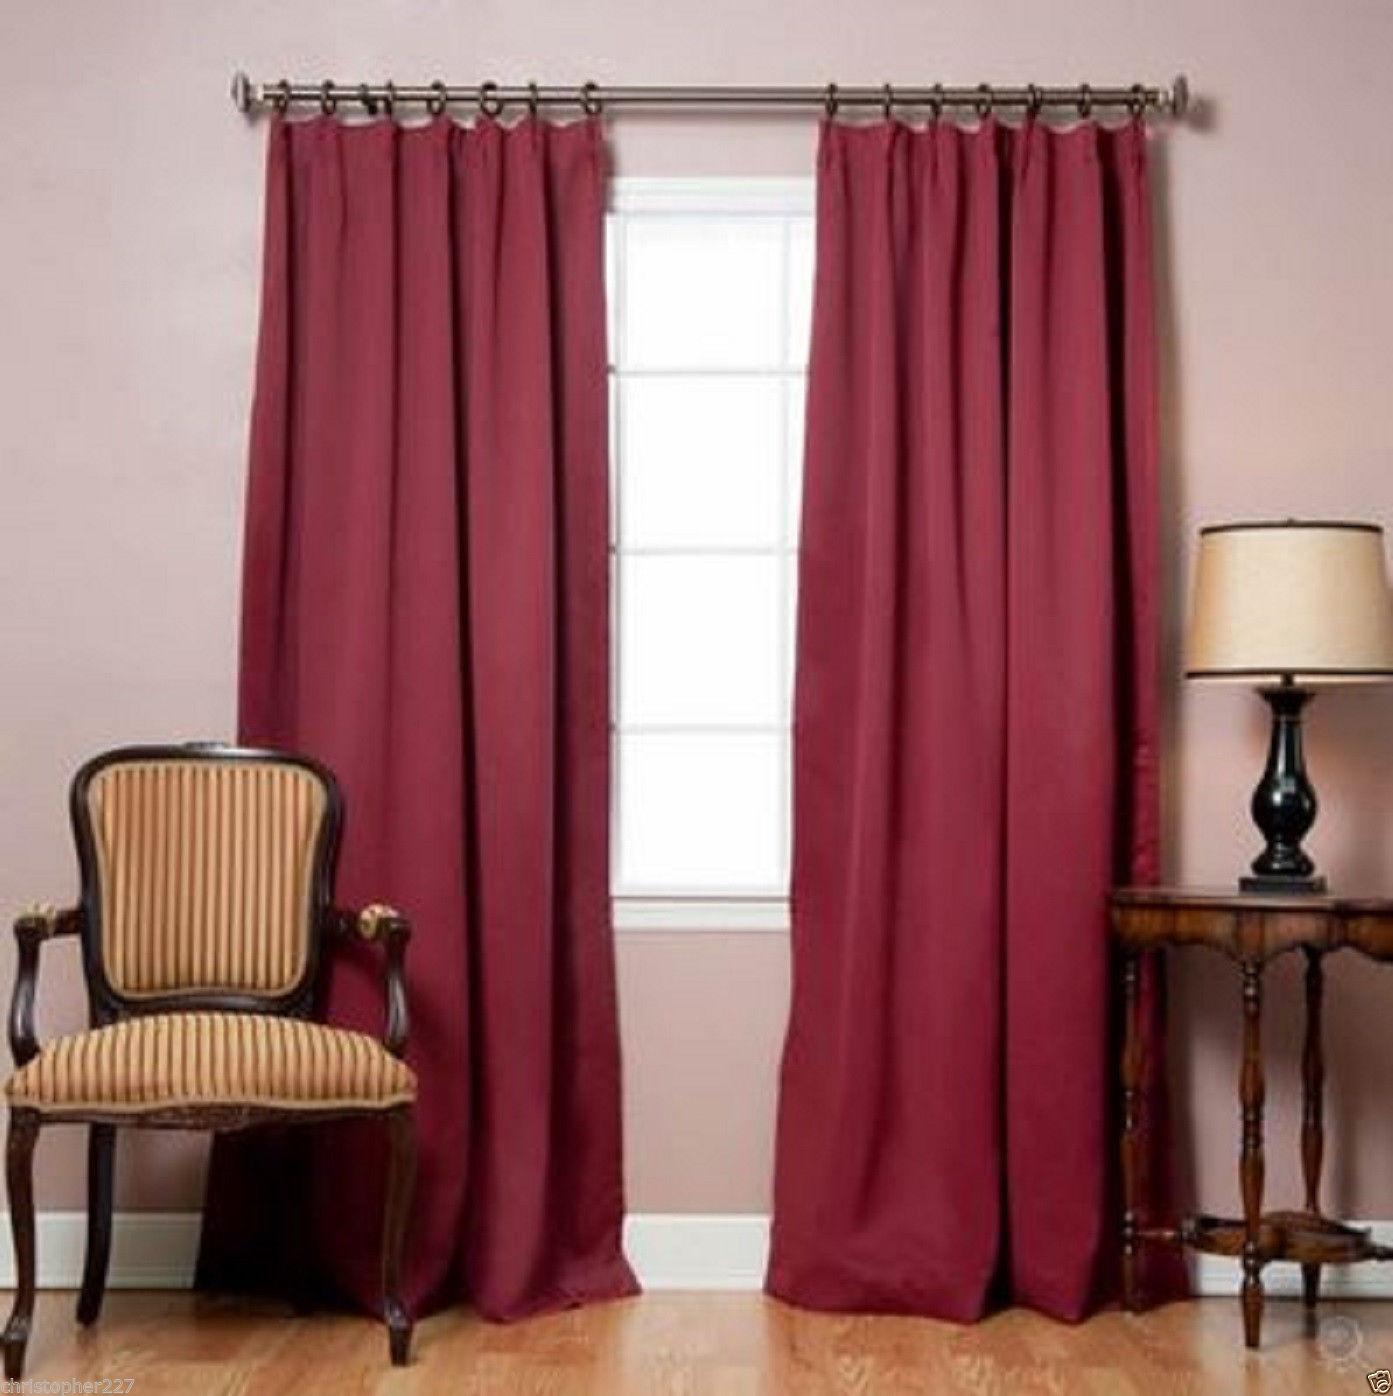 curtains insulated treatments patio door livingroom decor curtains